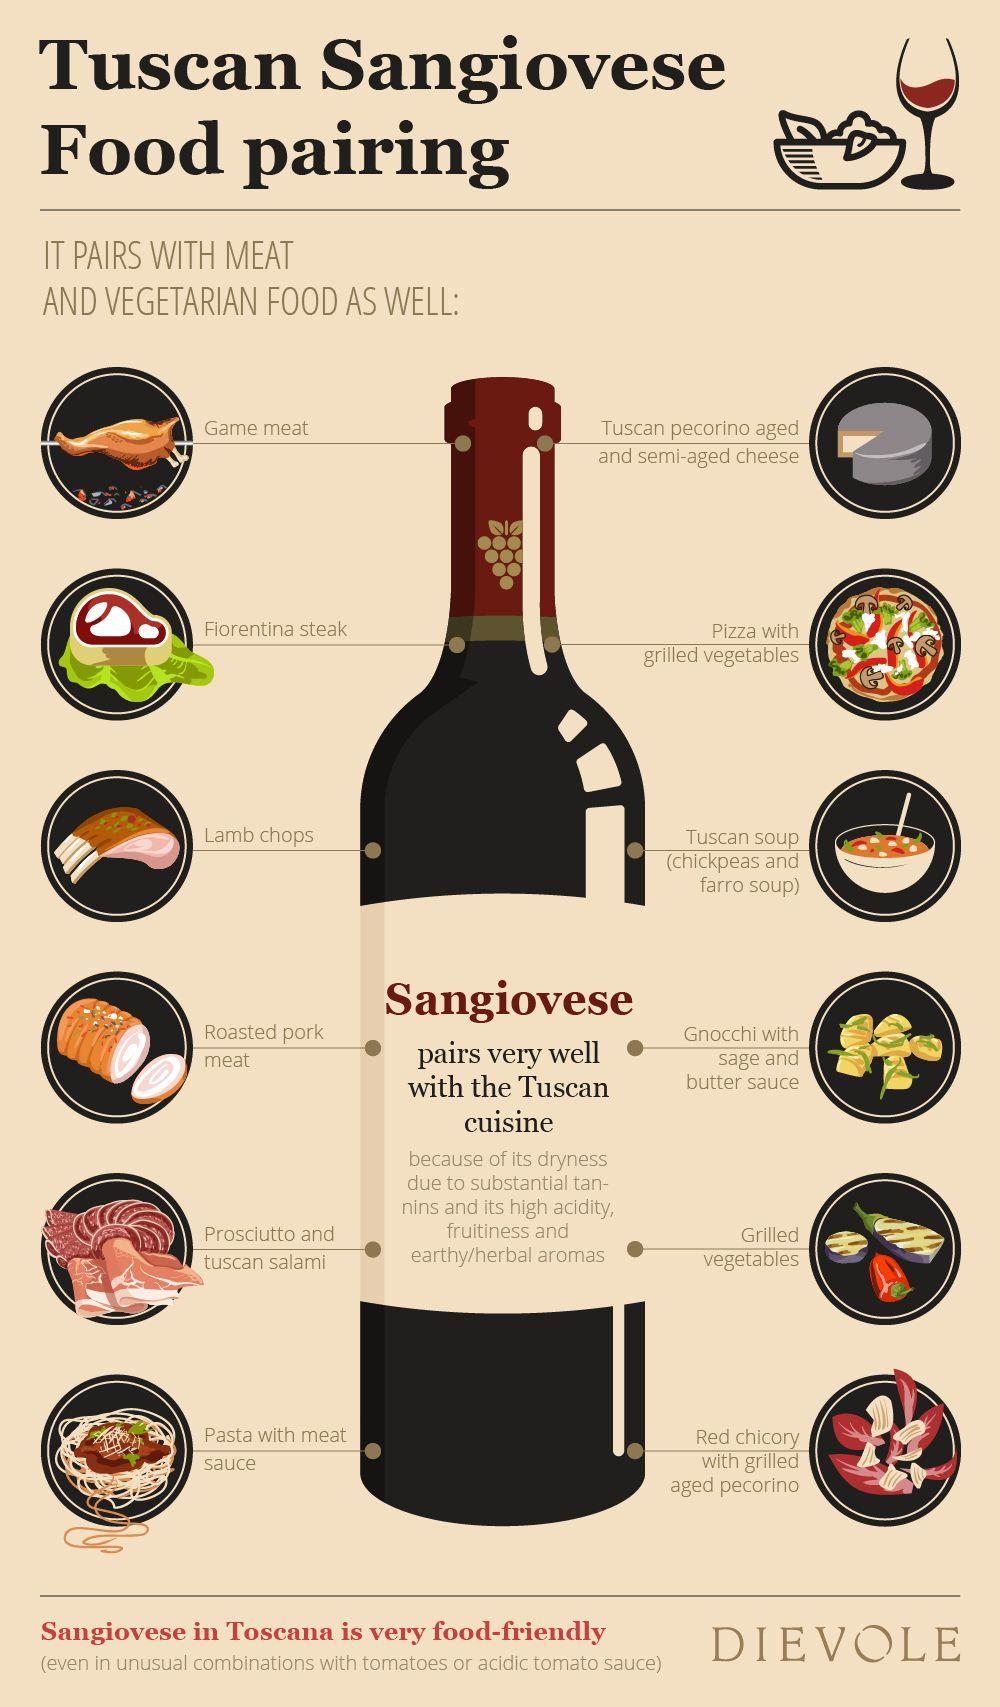 12 Foods To Pair With Sangiovese Food Pairings Wine Food Pairing Tuscan Wine